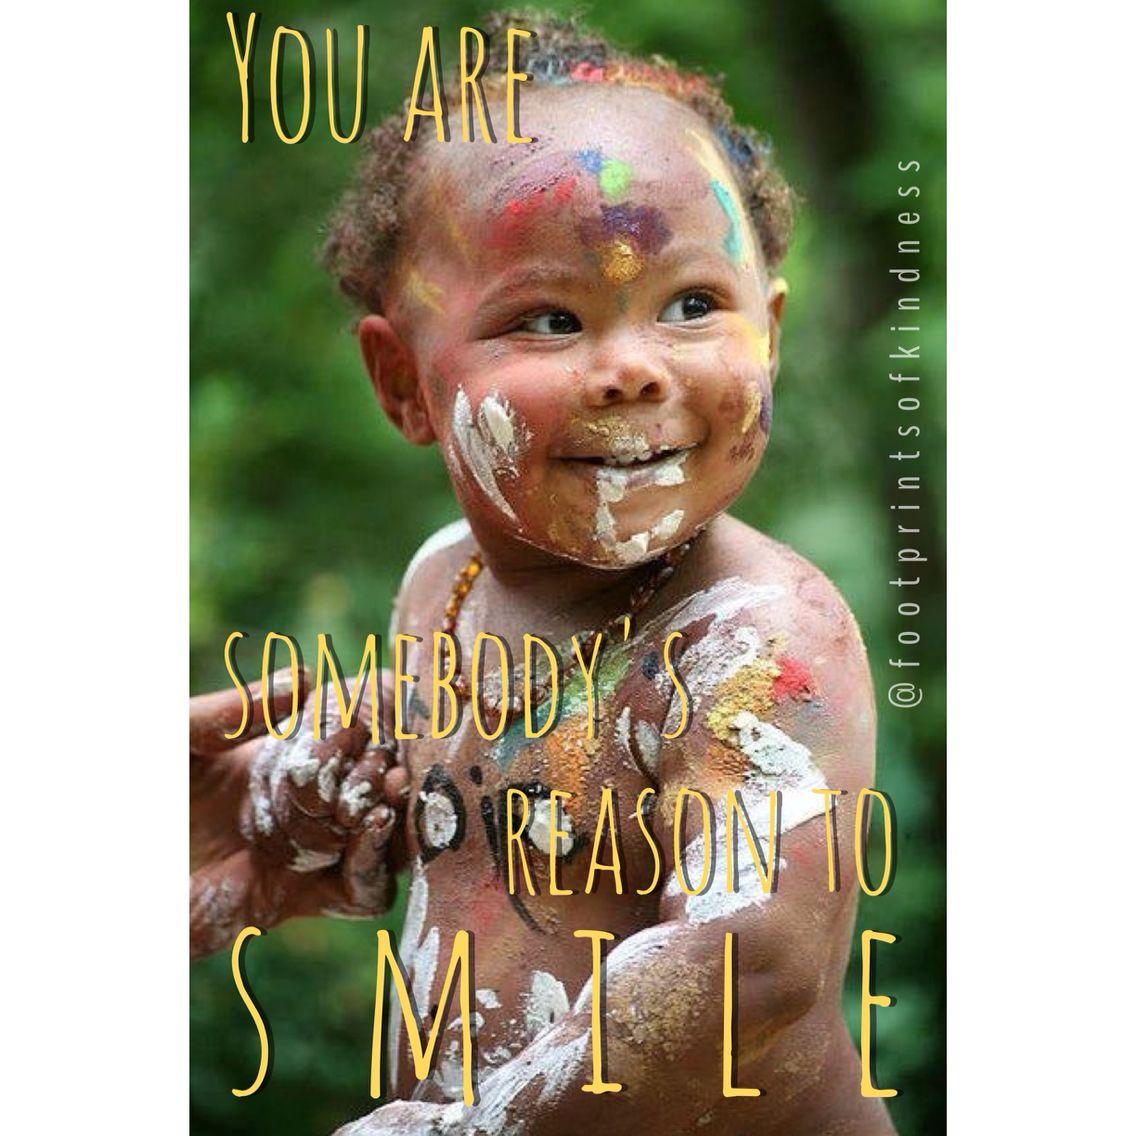 Smile #smile #life @footprintsofkindness